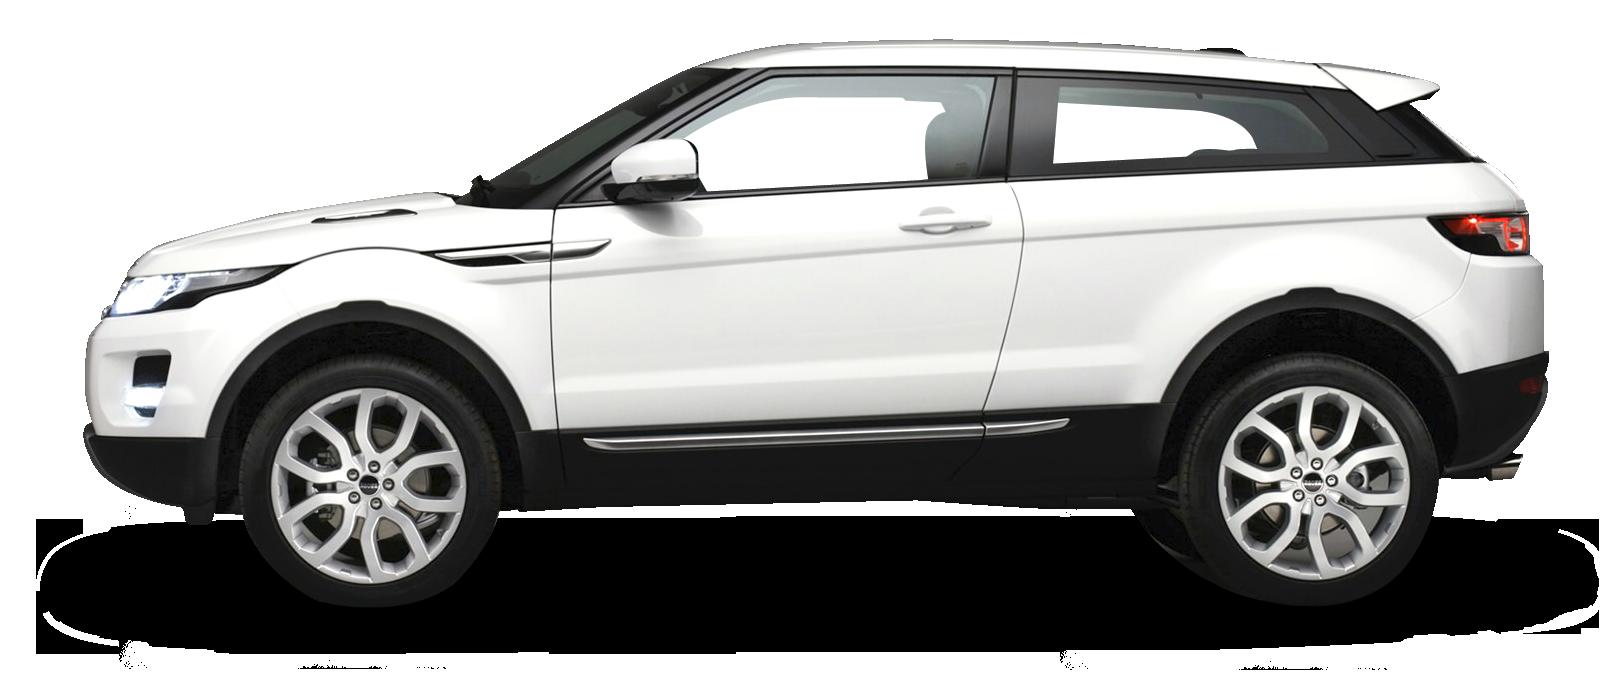 Range Rover Evoque Car PNG Image